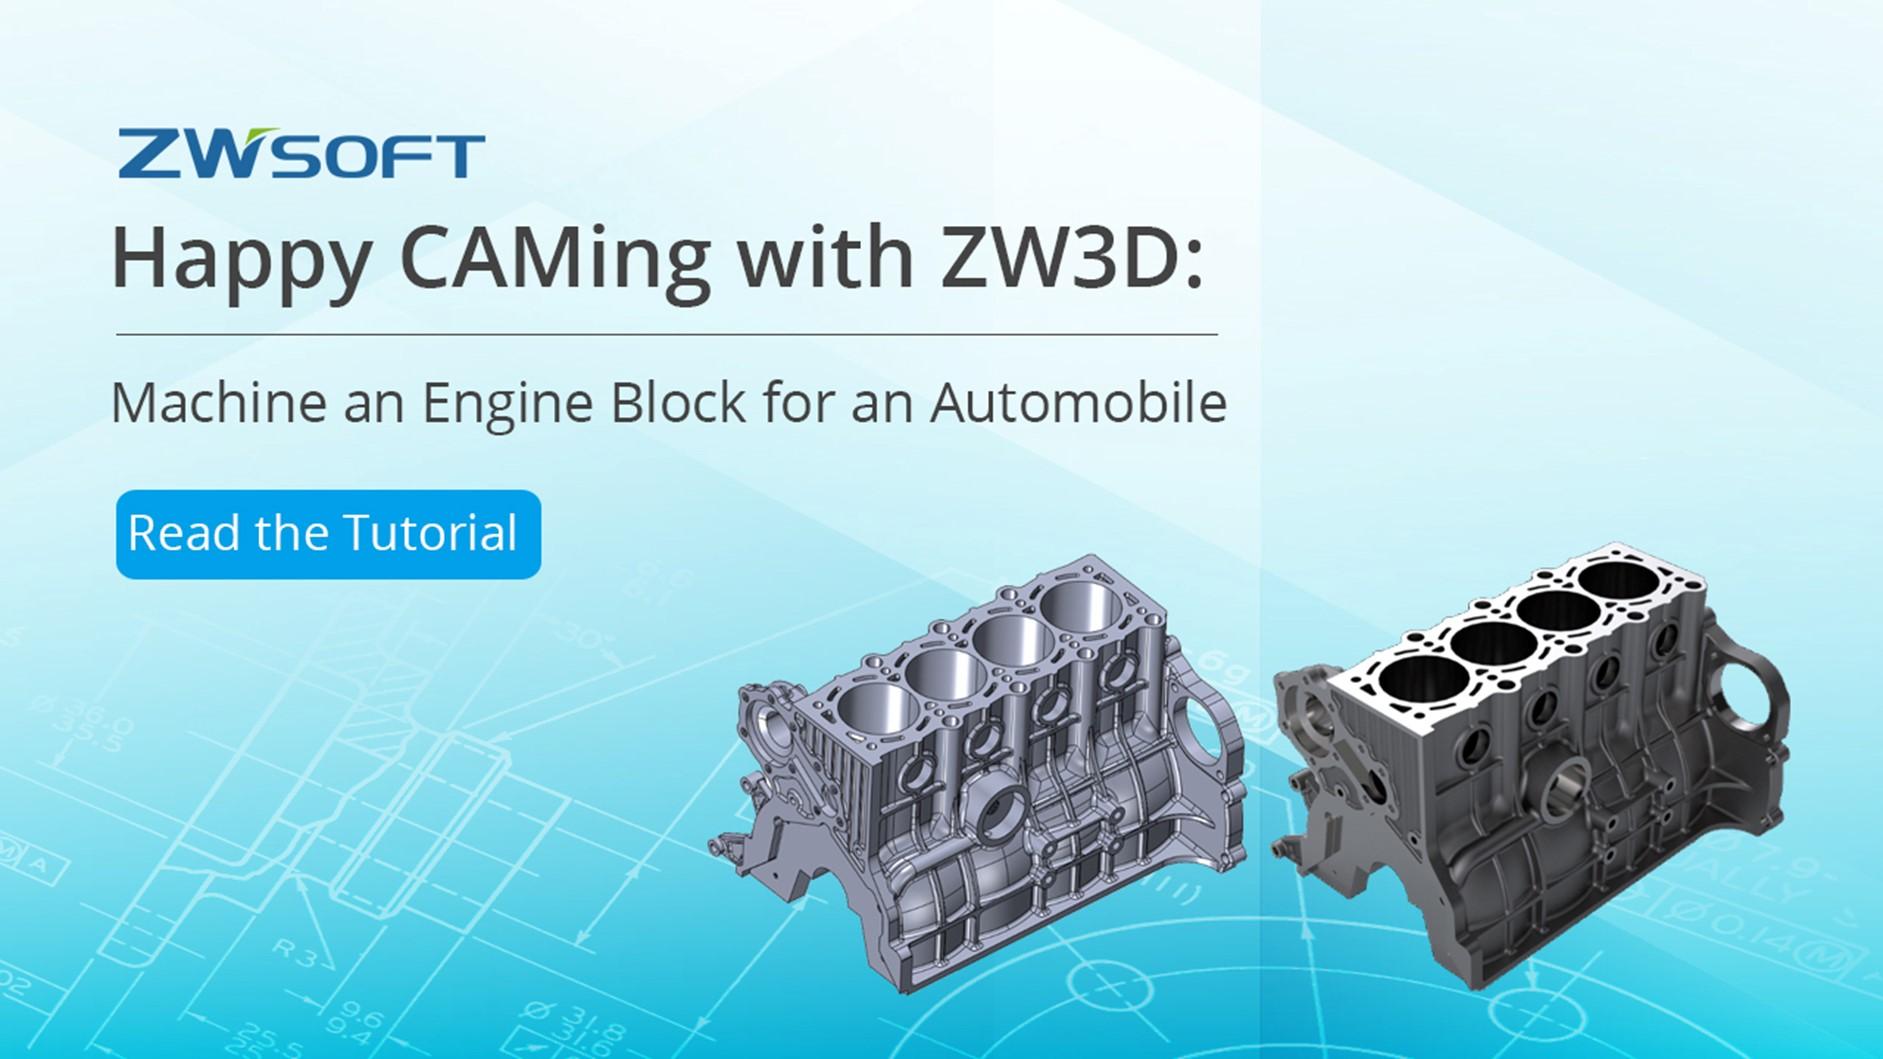 ZW3Dで快適なCAM作業 :自動車用エンジンブロックの加工